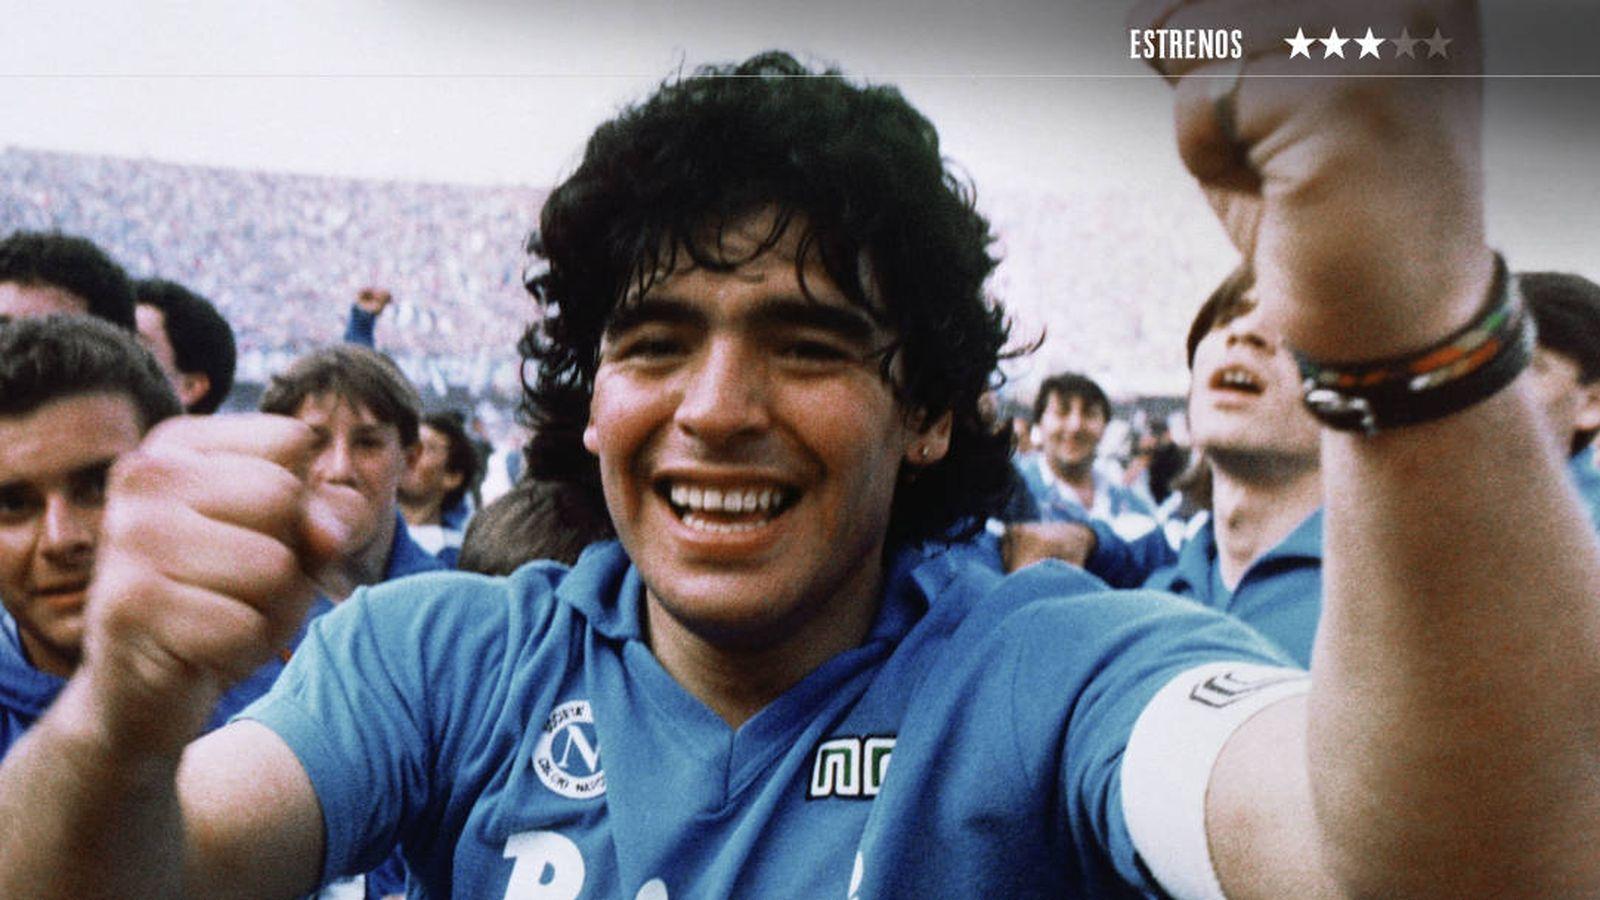 Foto: Asif Kapadia dirige el documental sobre Diego Armando Maradona. (Avalon)